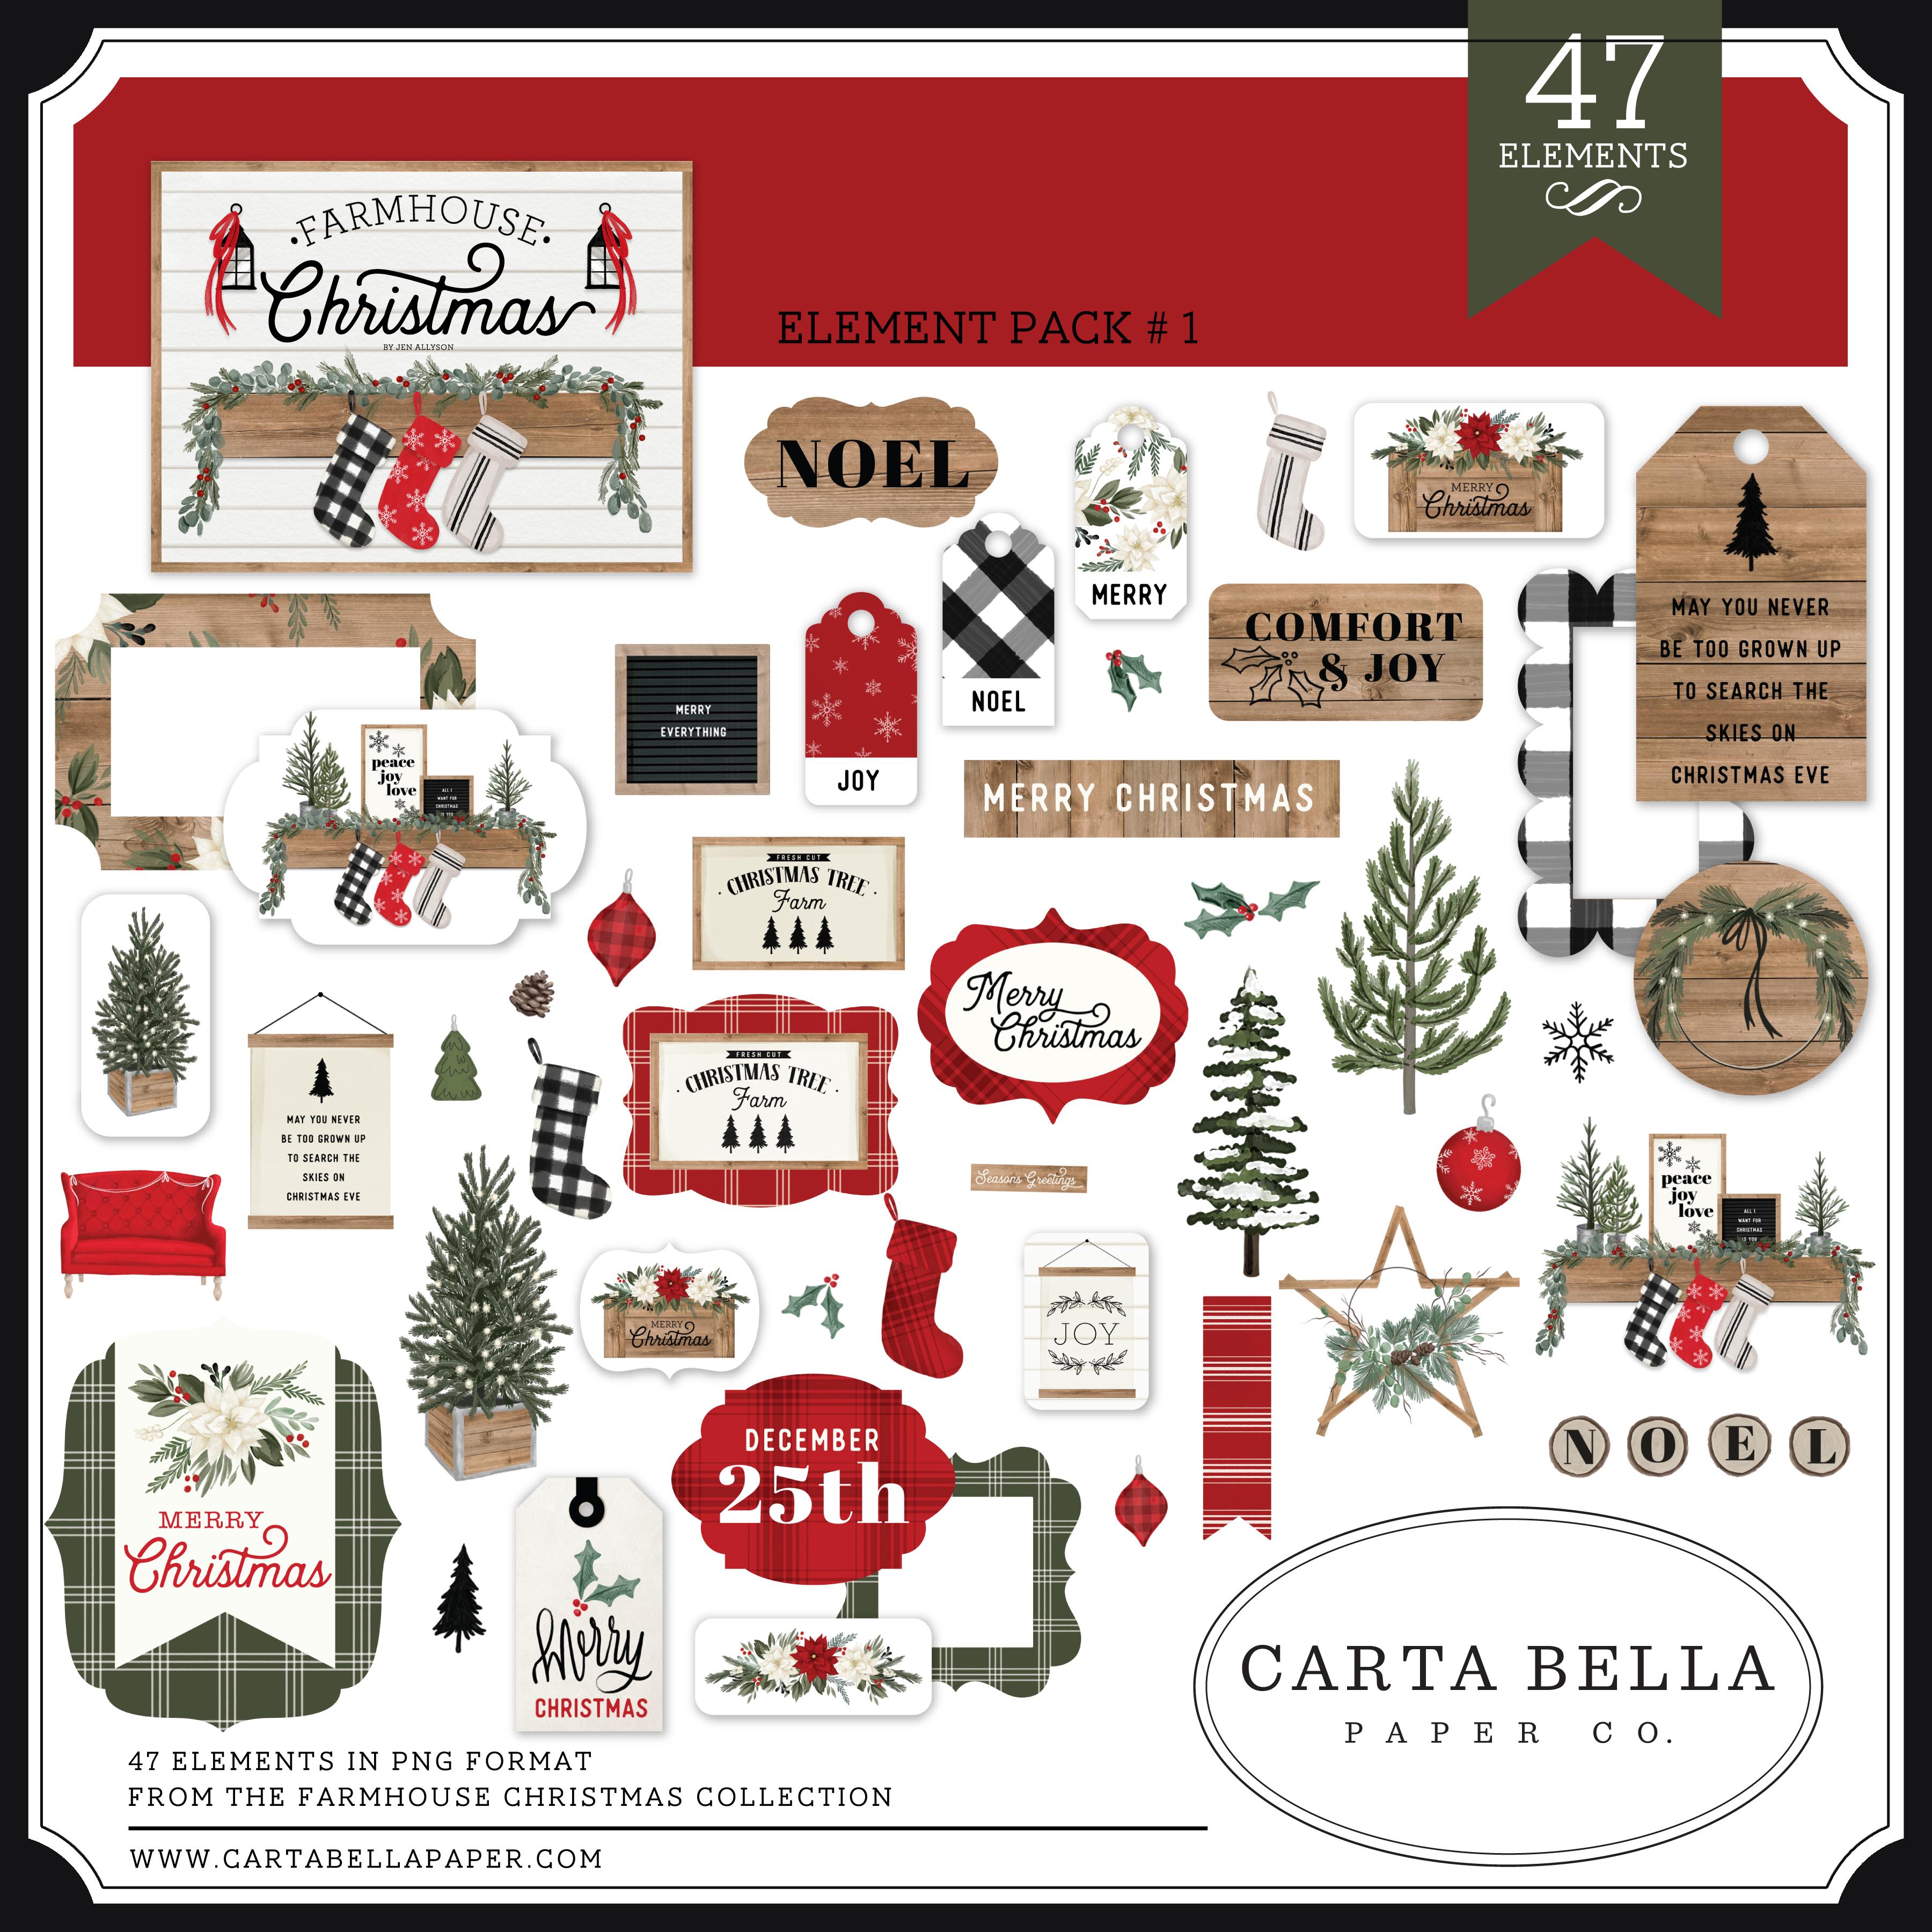 Farmhouse Christmas Element Pack #1